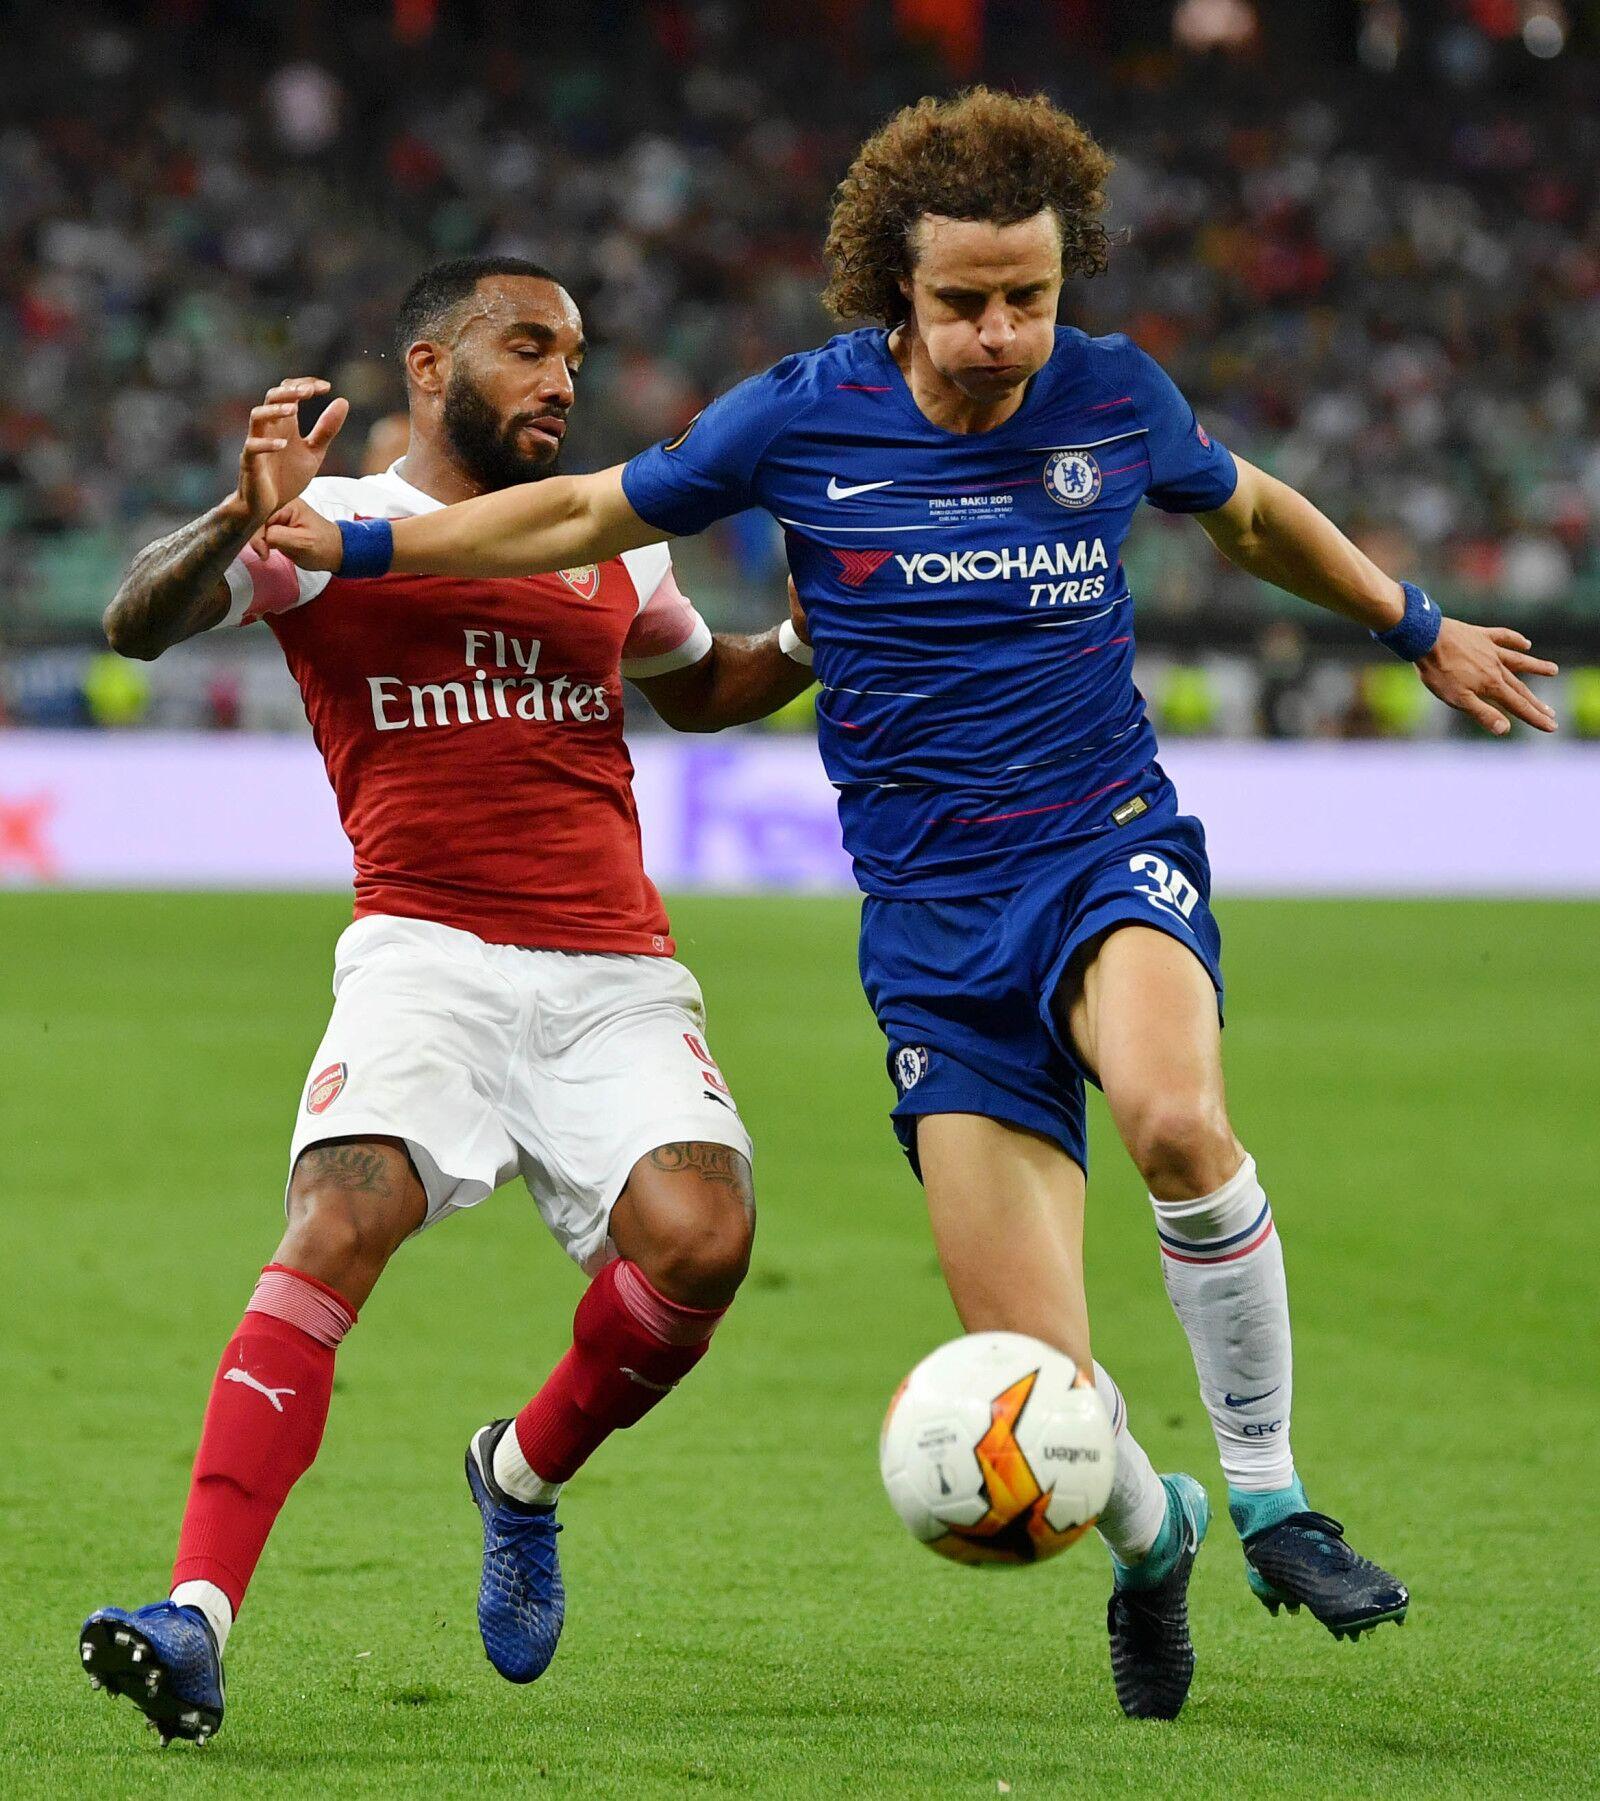 Arsenal make second deadline day signing in David Luiz